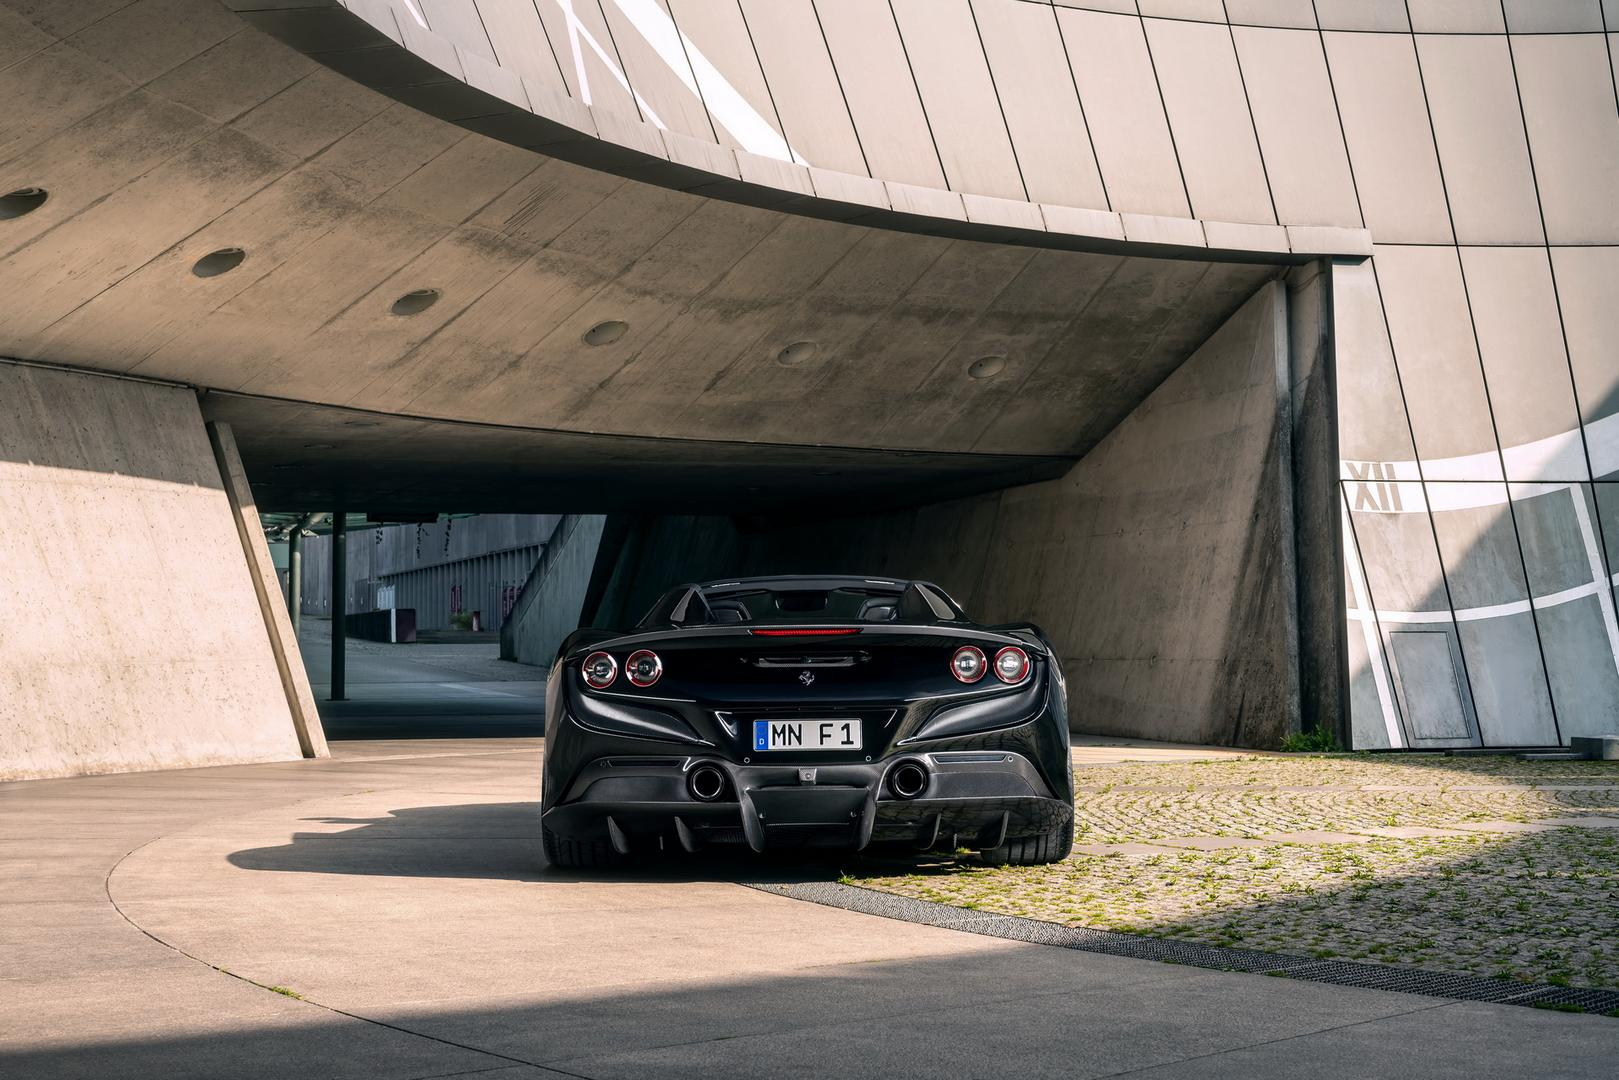 Novitec Ferrari F8 Spider rear view